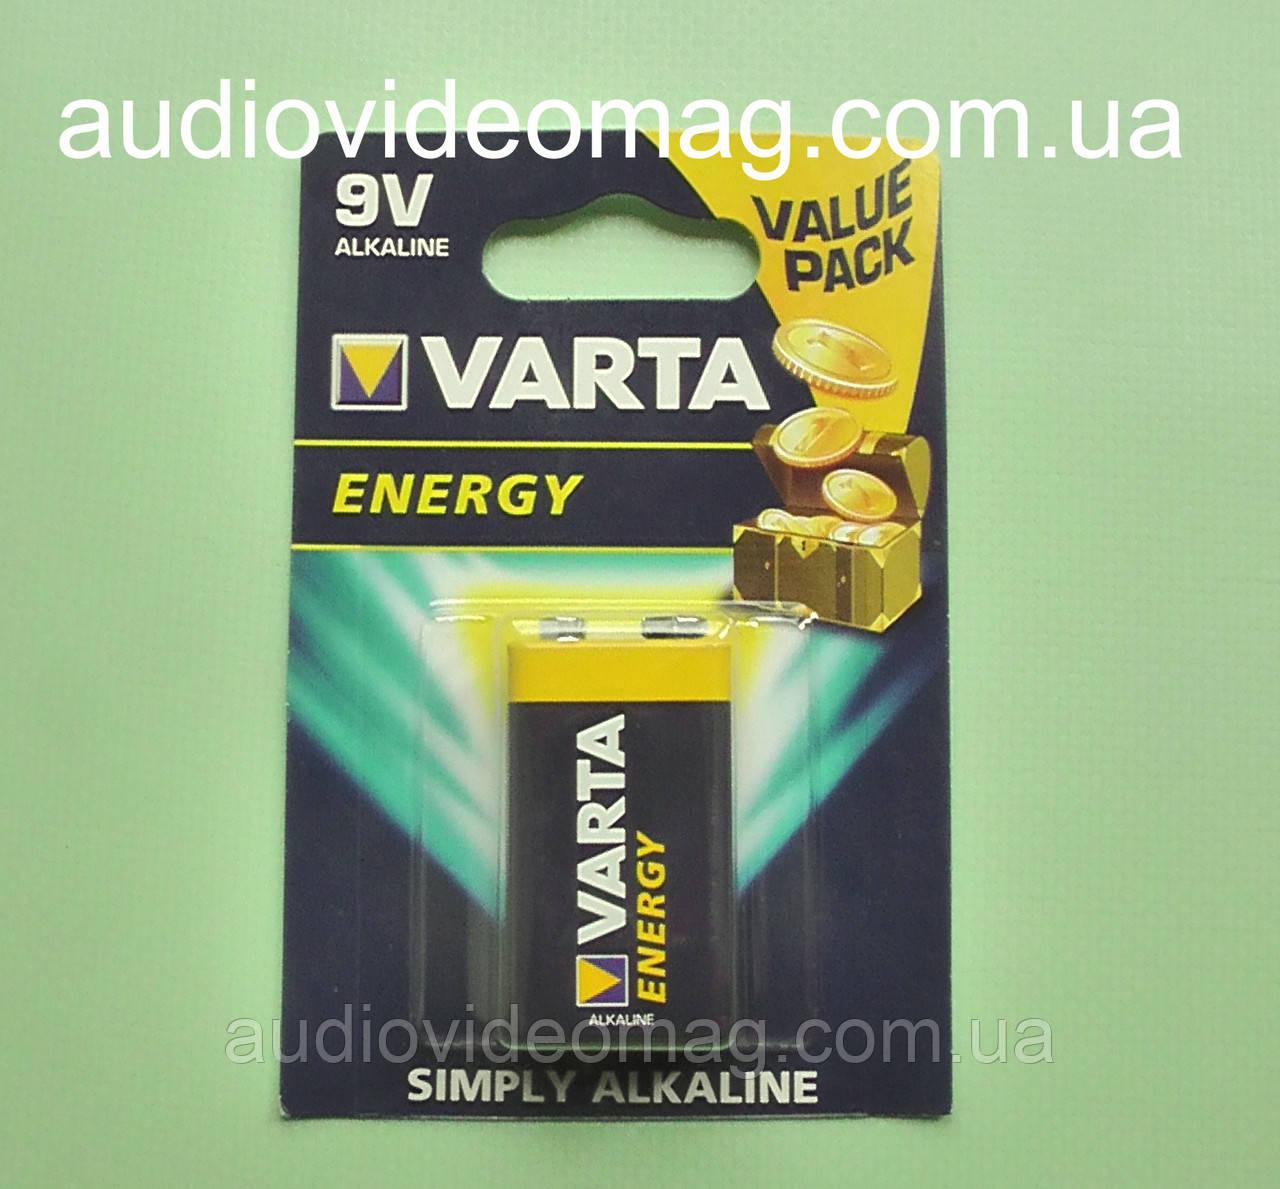 Батарейка Varta 6LR61 9V Аlkaline тип Крона, Корунд